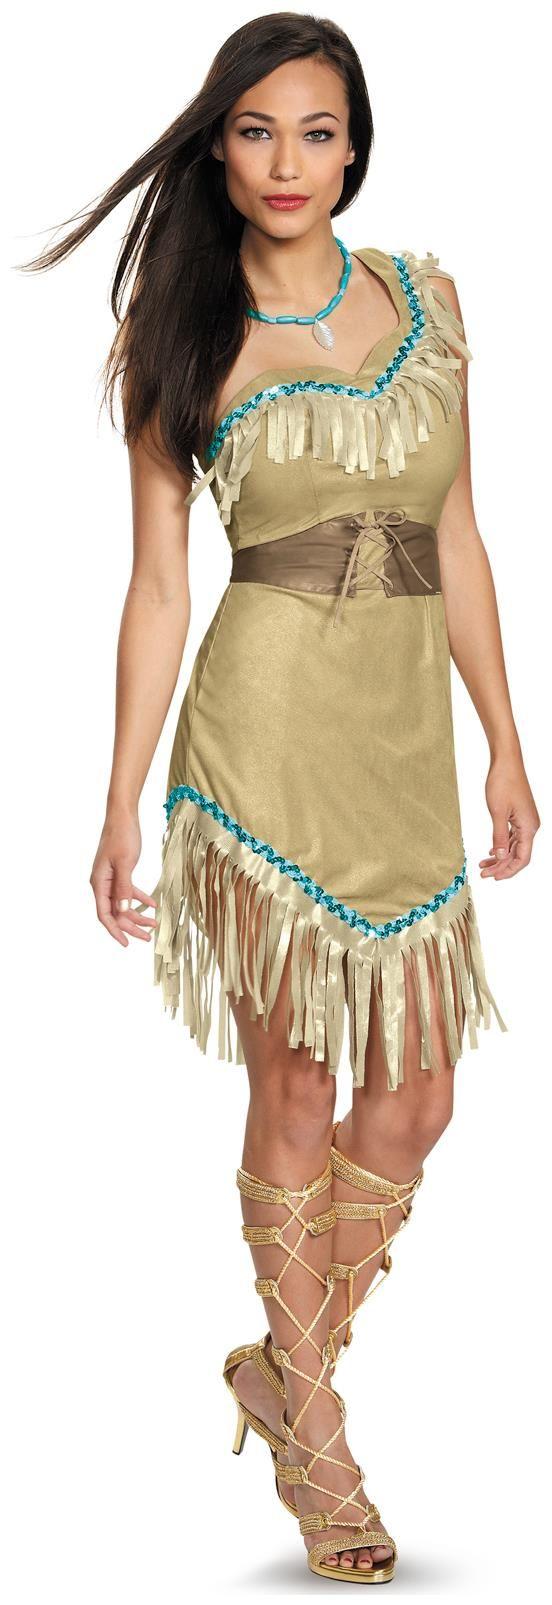 Disney Princess Deluxe Pocahontas Costume For Women